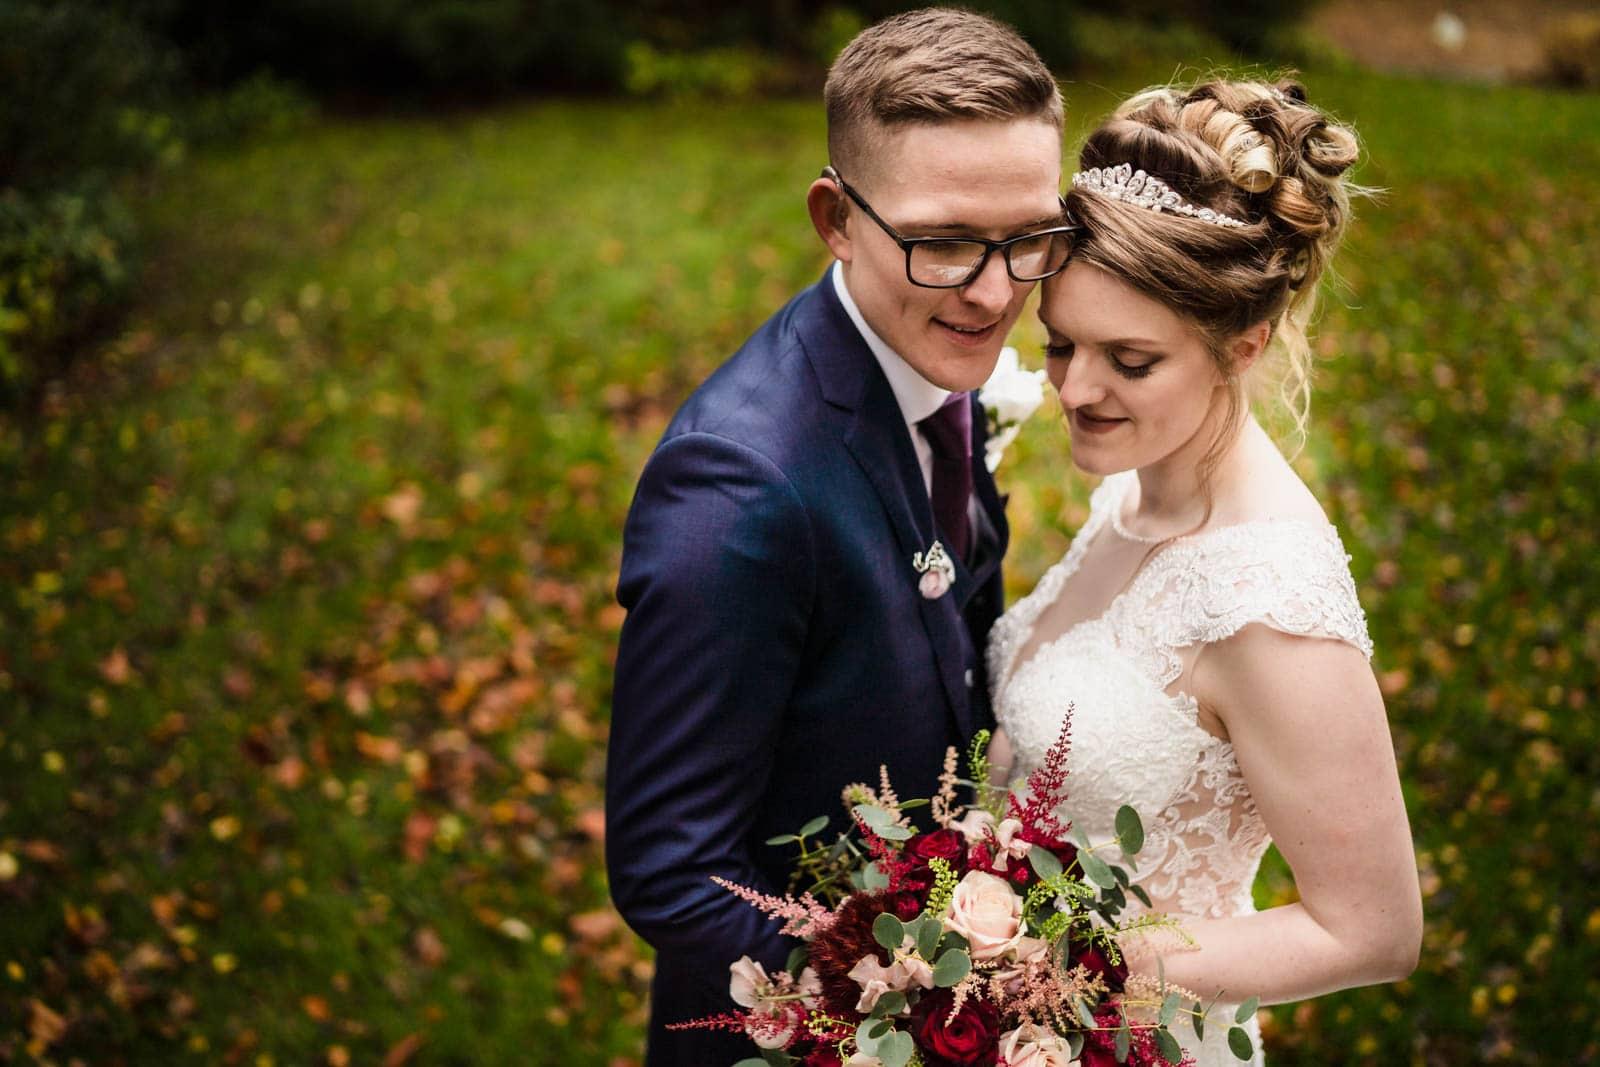 Autumnal bride and groom portrait